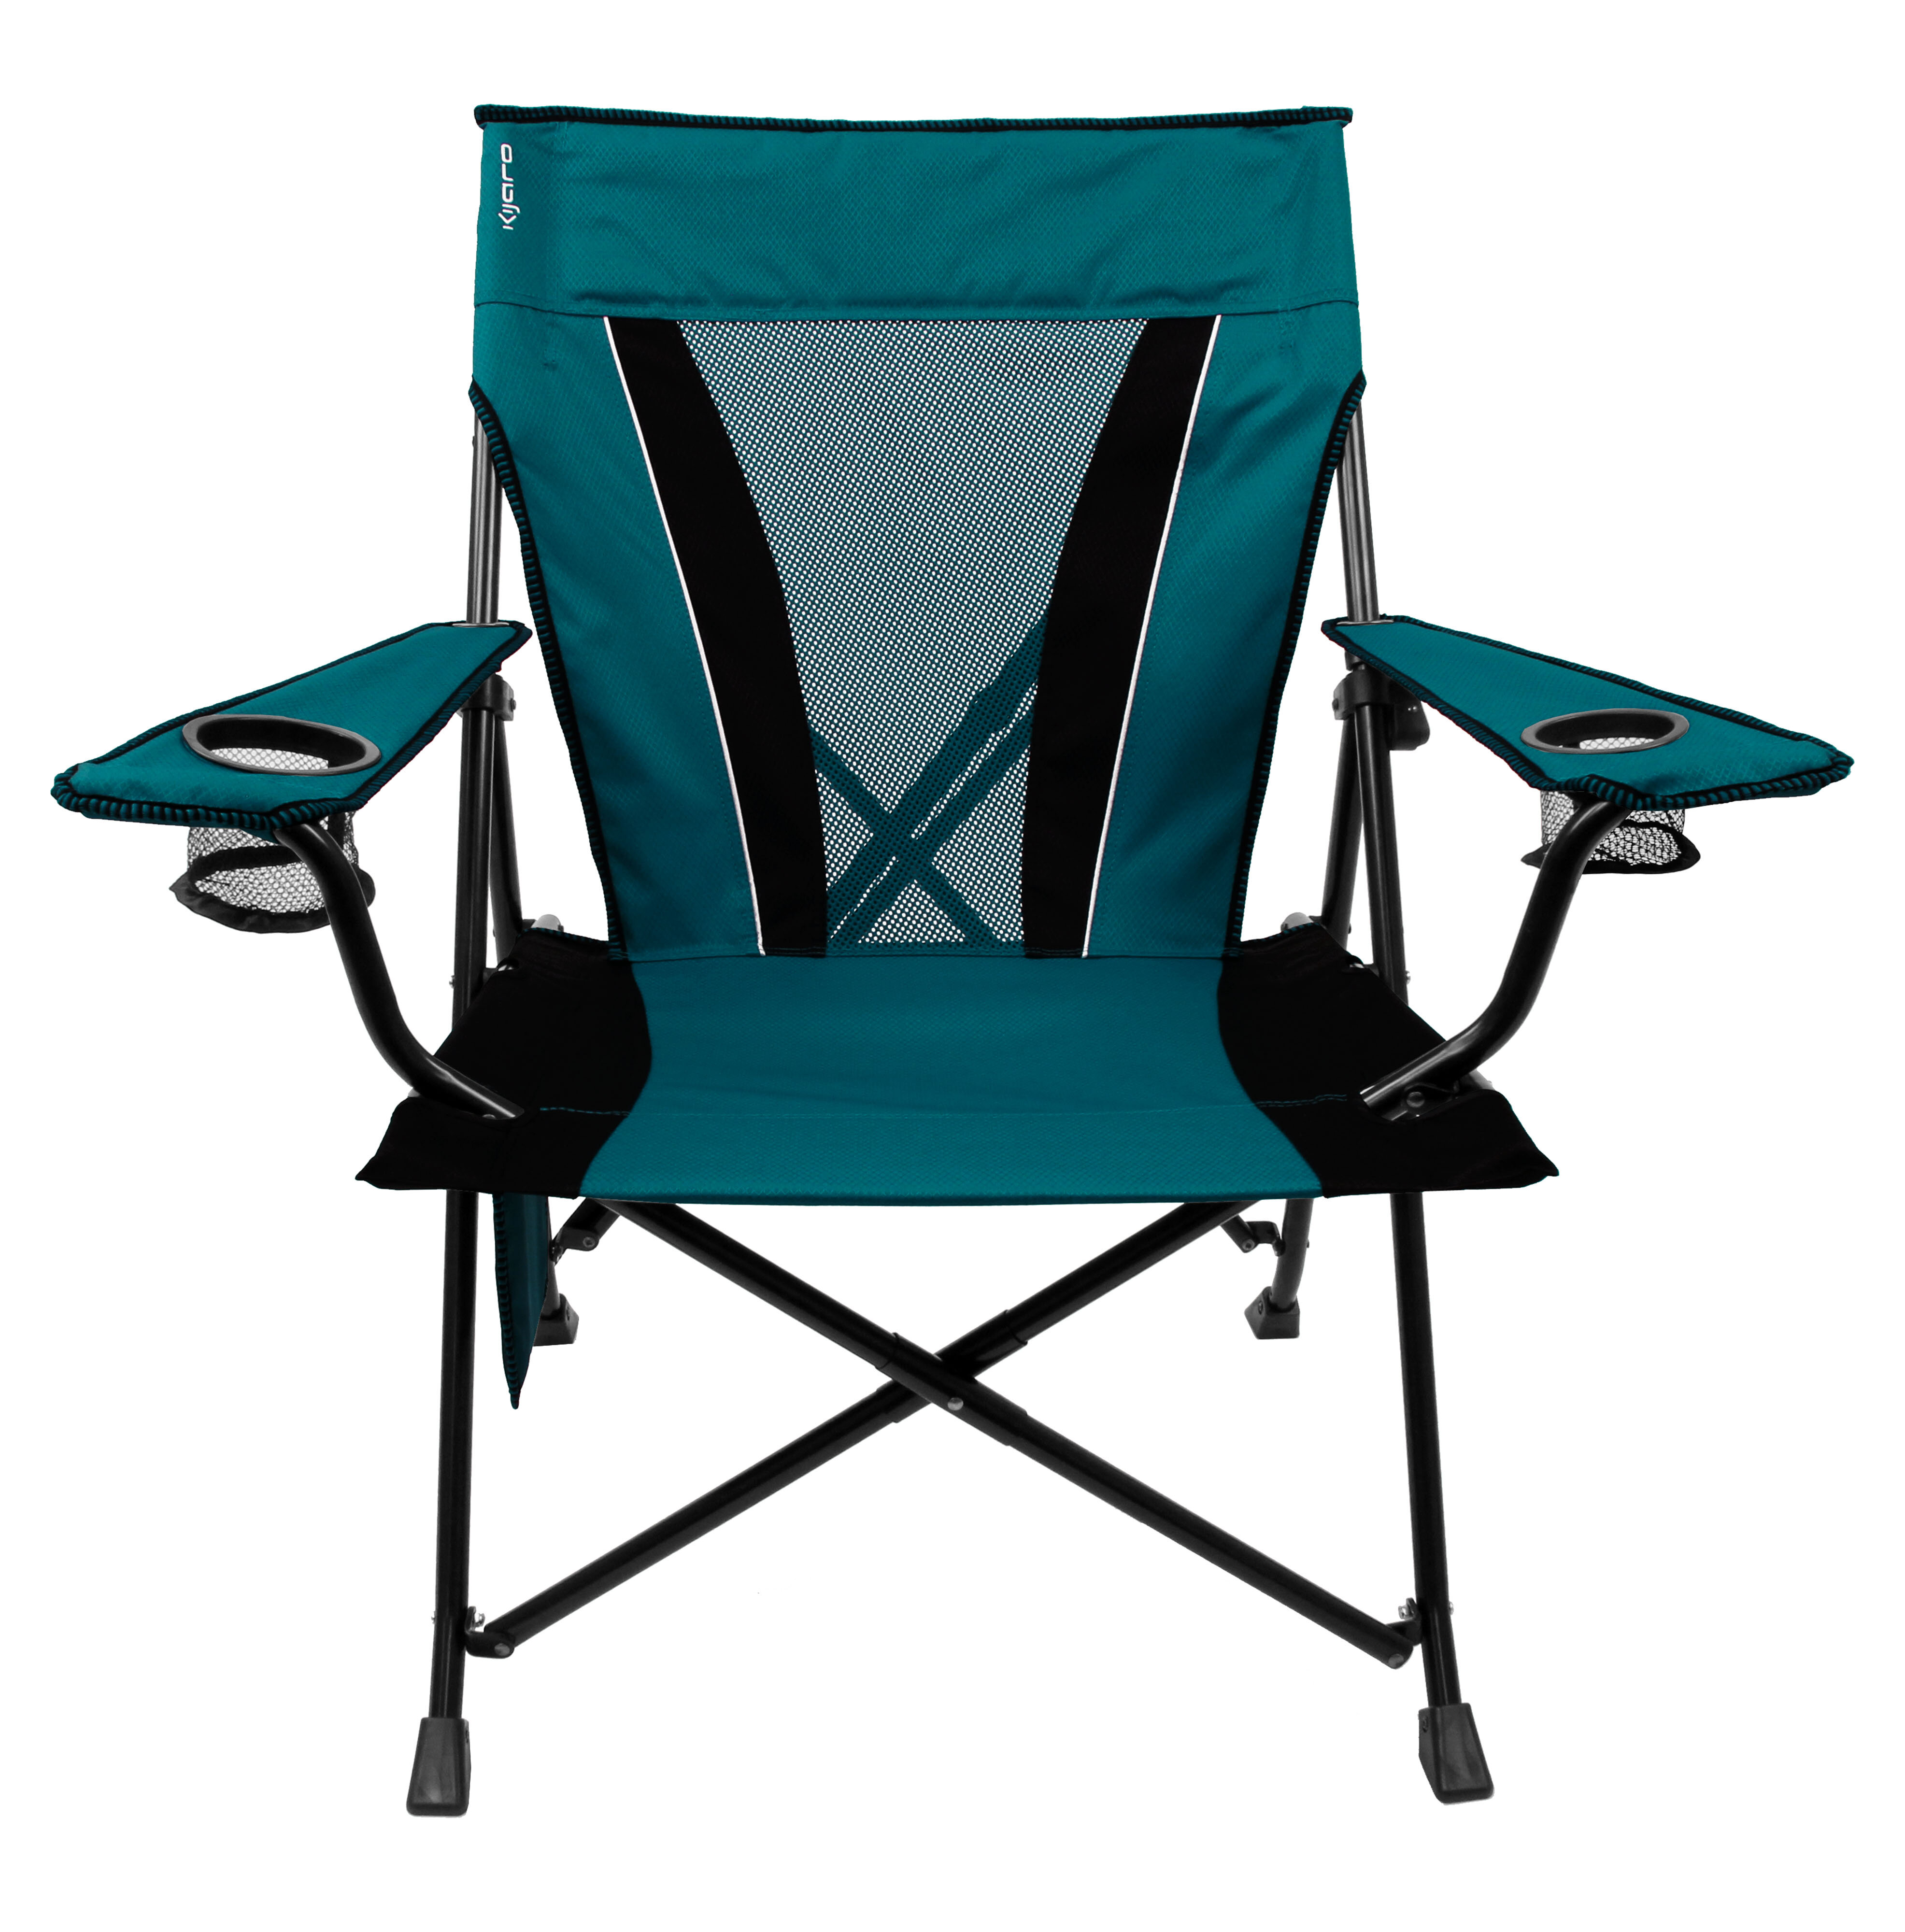 Kijaro XXL Dual Lock Folding Camping Chair & Reviews